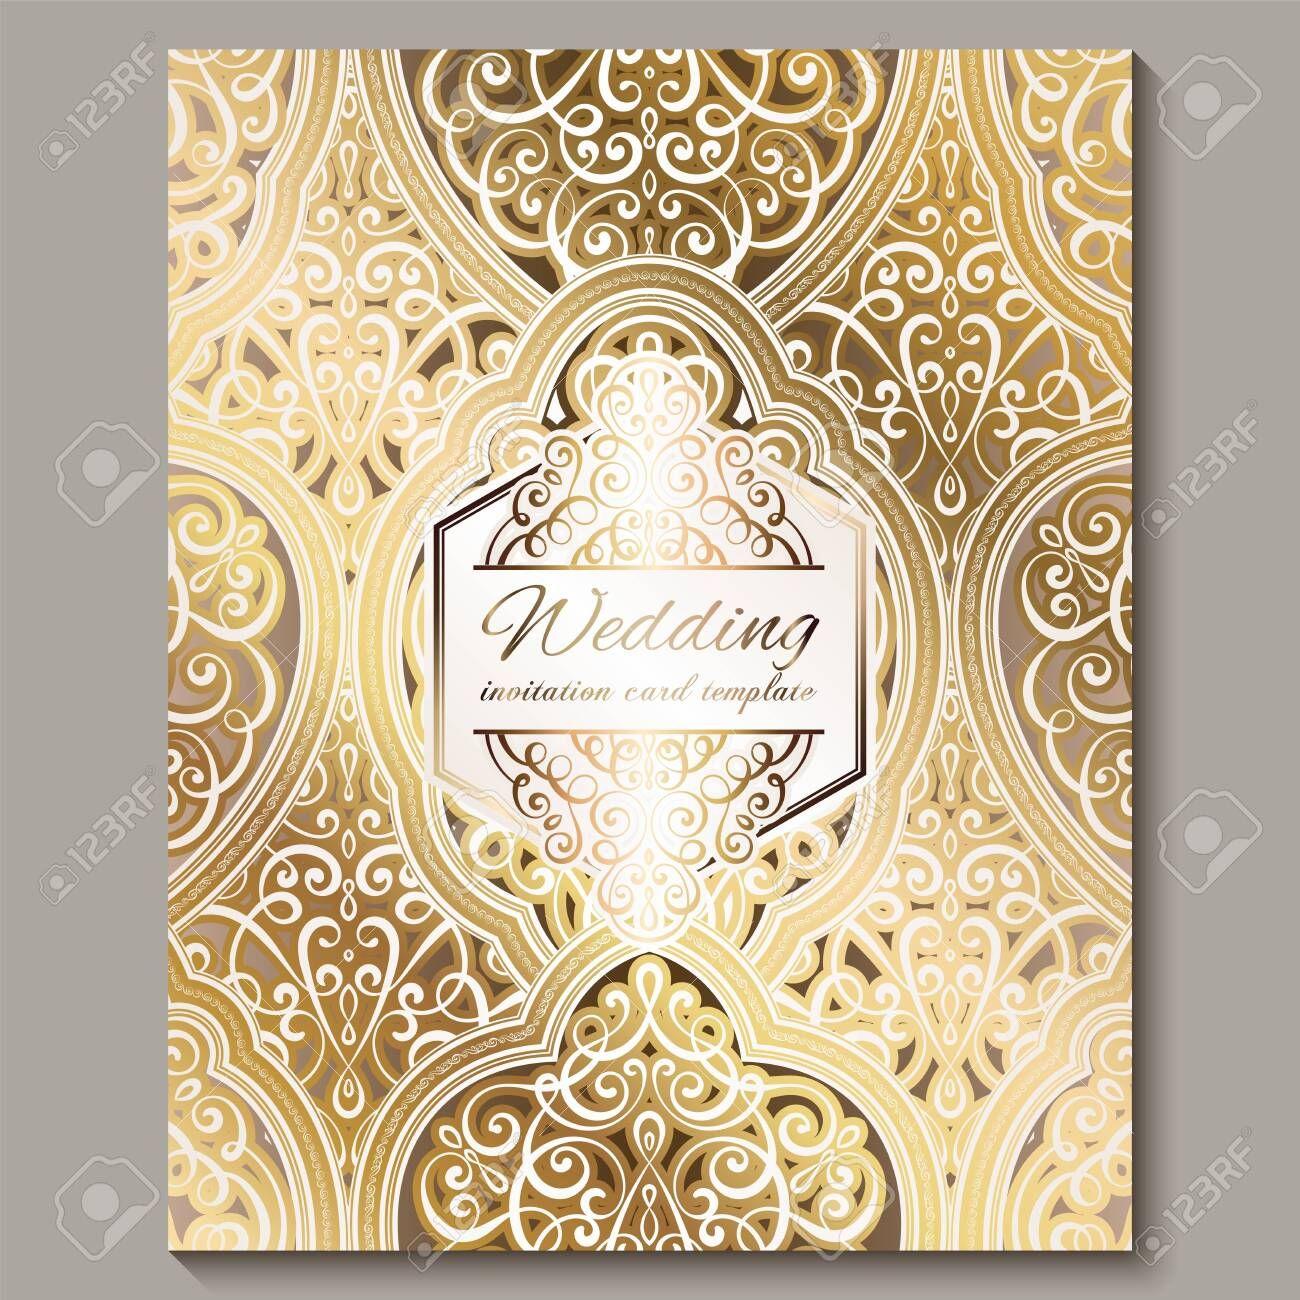 Wedding Invitation Card With Gold Shiny Eastern And Baroque Rich Foliage Ornate Wedding Invitation Card Template Wedding Invitation Cards Wedding Invitations